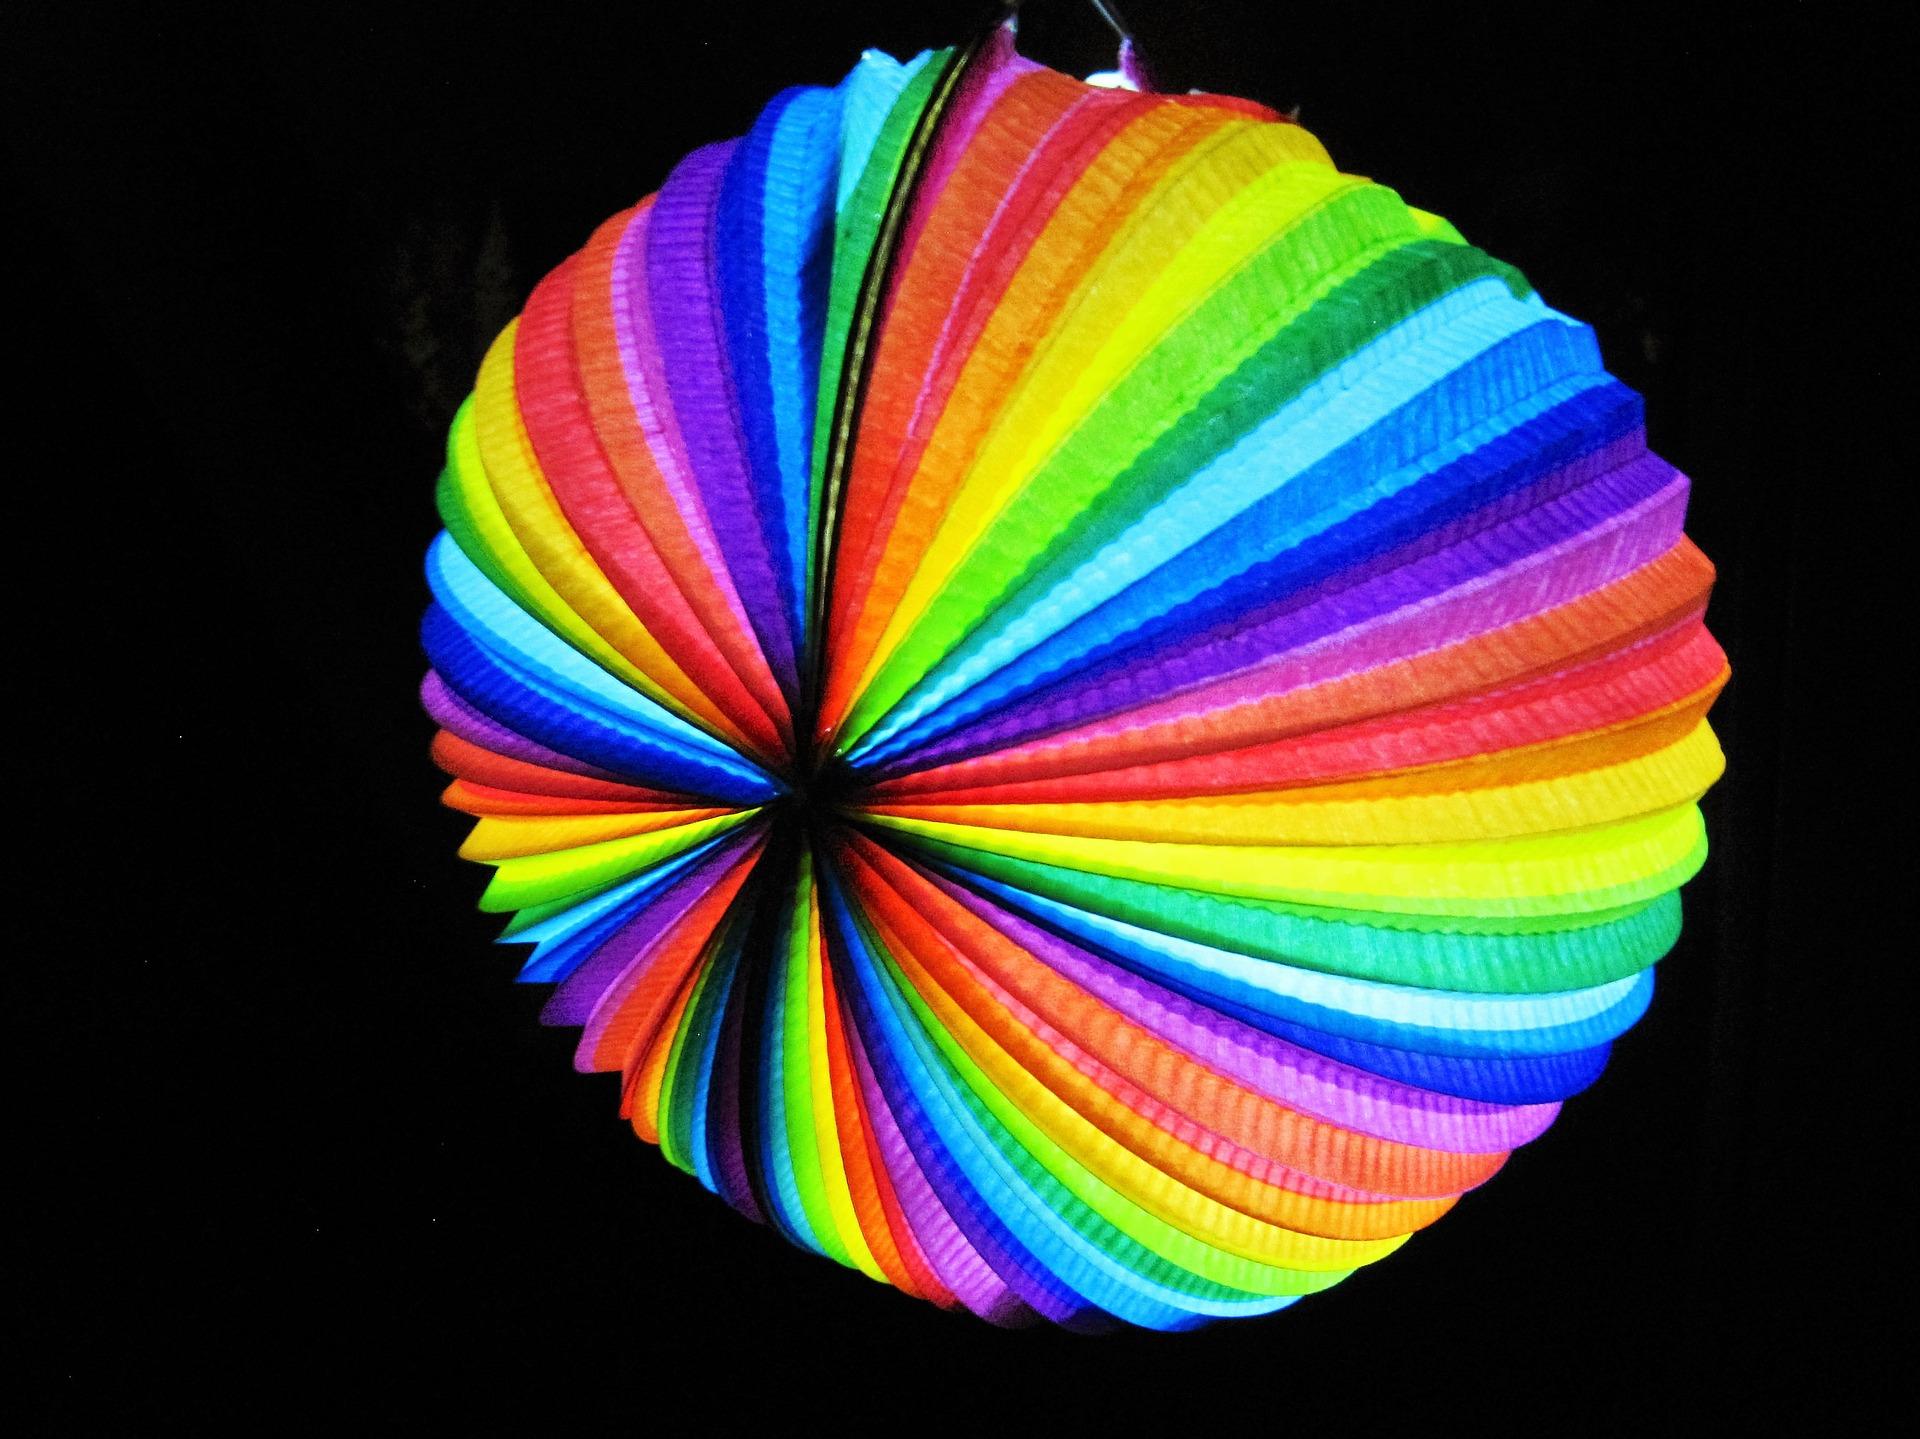 colorful-lantern-1812467_1920 (2).jpg